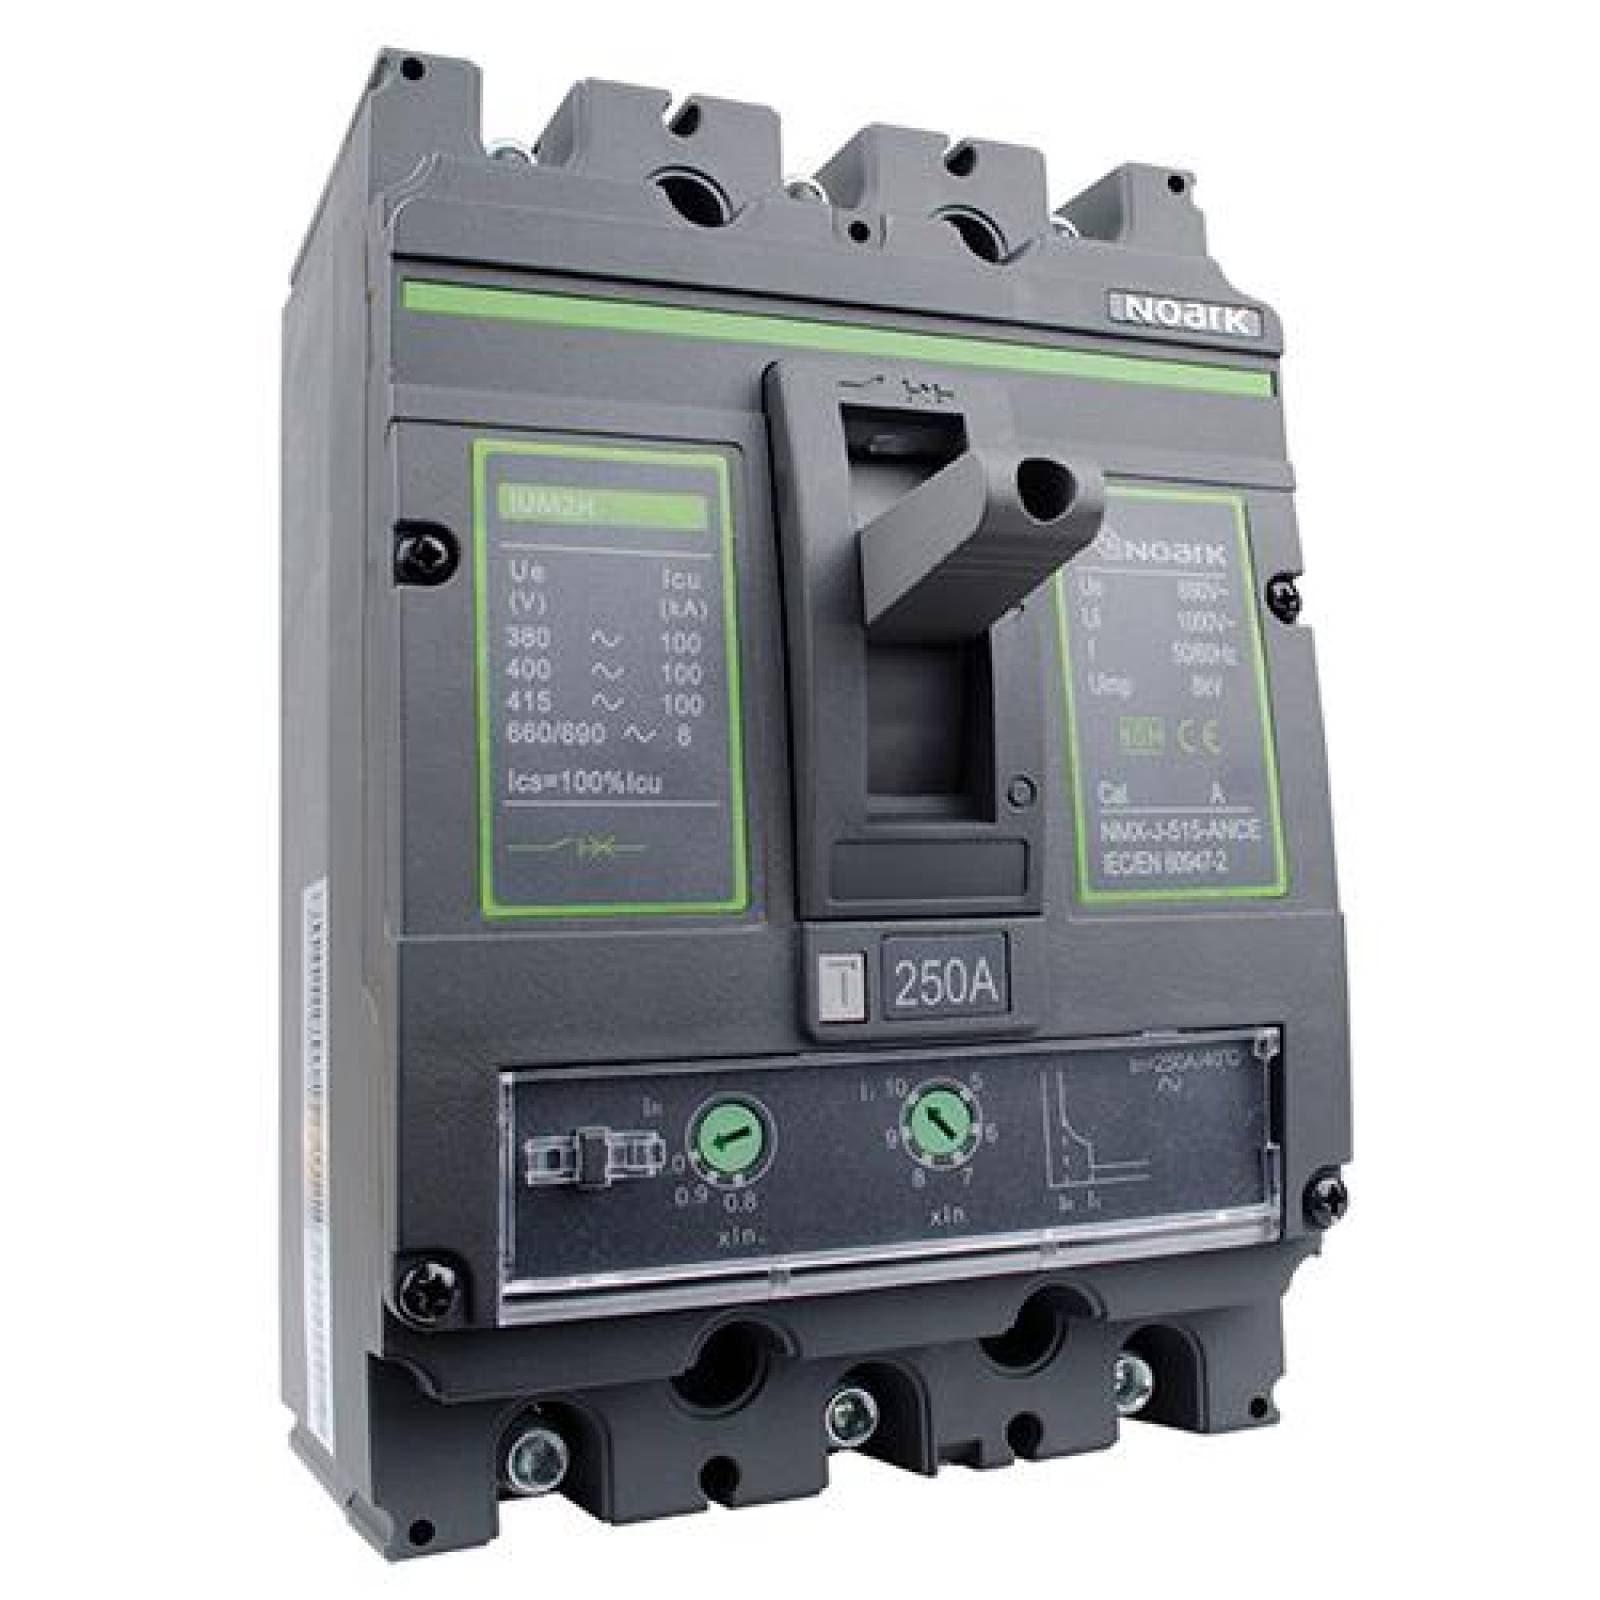 Interruptor termomagnético 3 polos 350 Amp